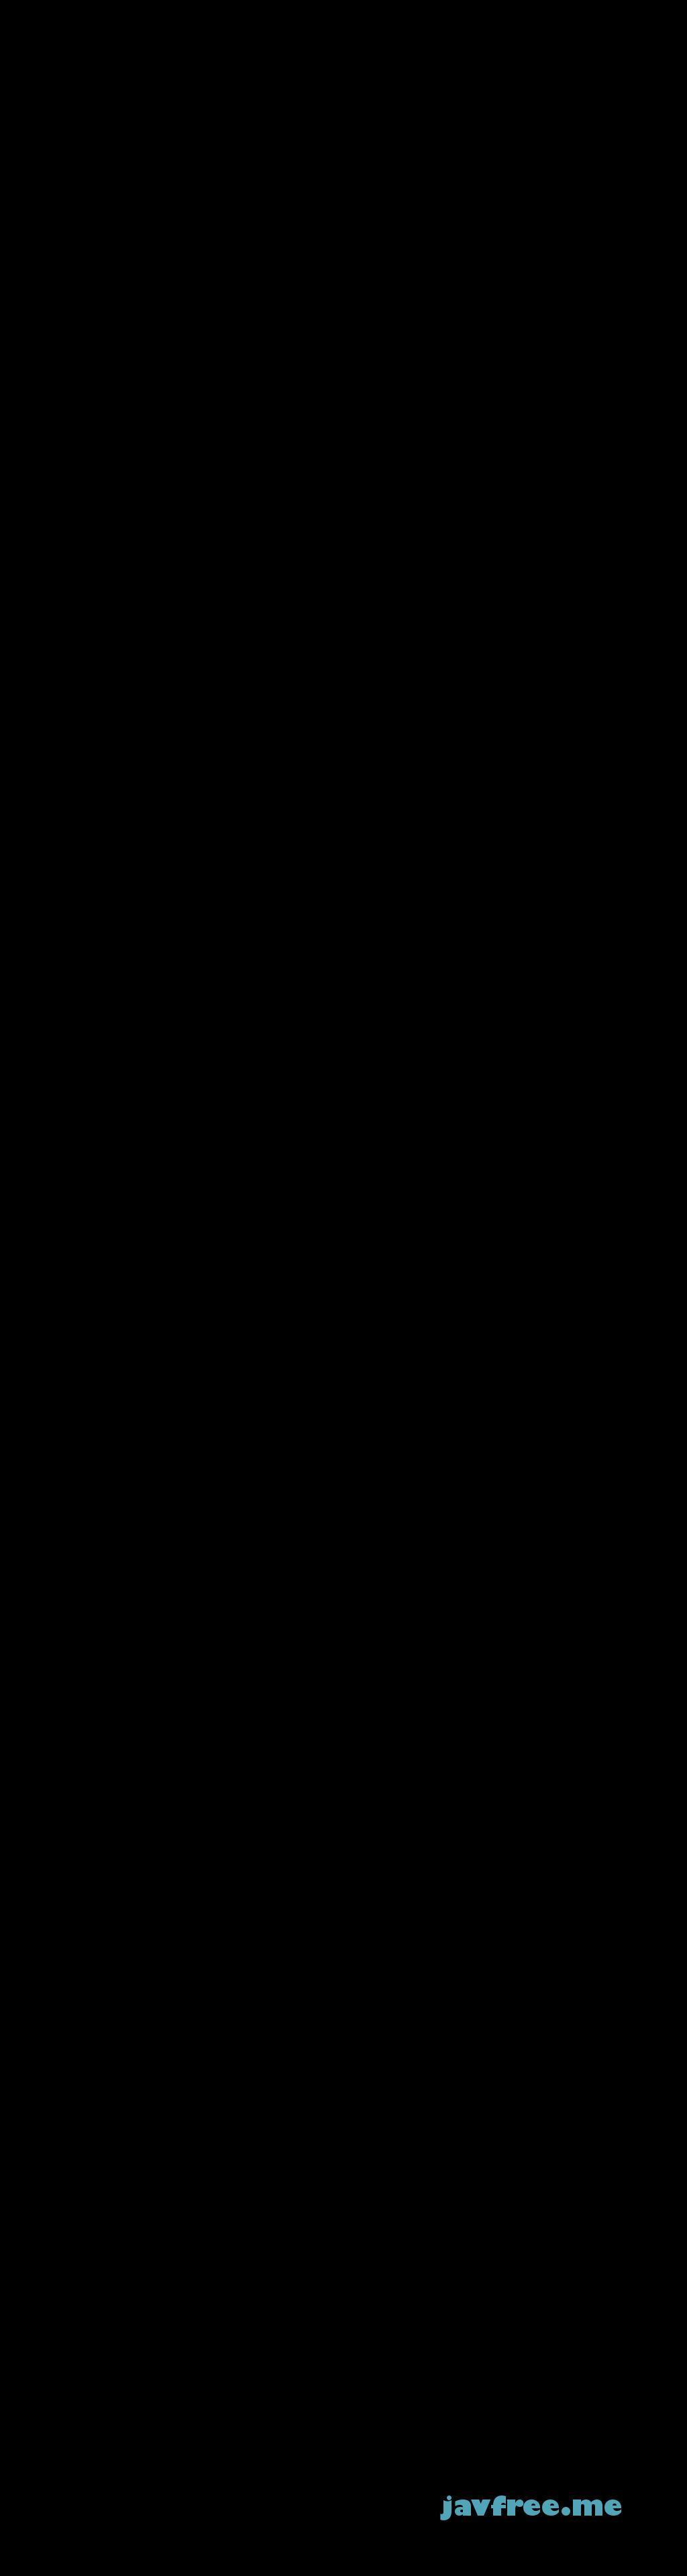 [AAJB-130] 【AV30】完全生涯保存版 永遠なる淫舞 美しき女神たち - image AAJB-130d on https://javfree.me